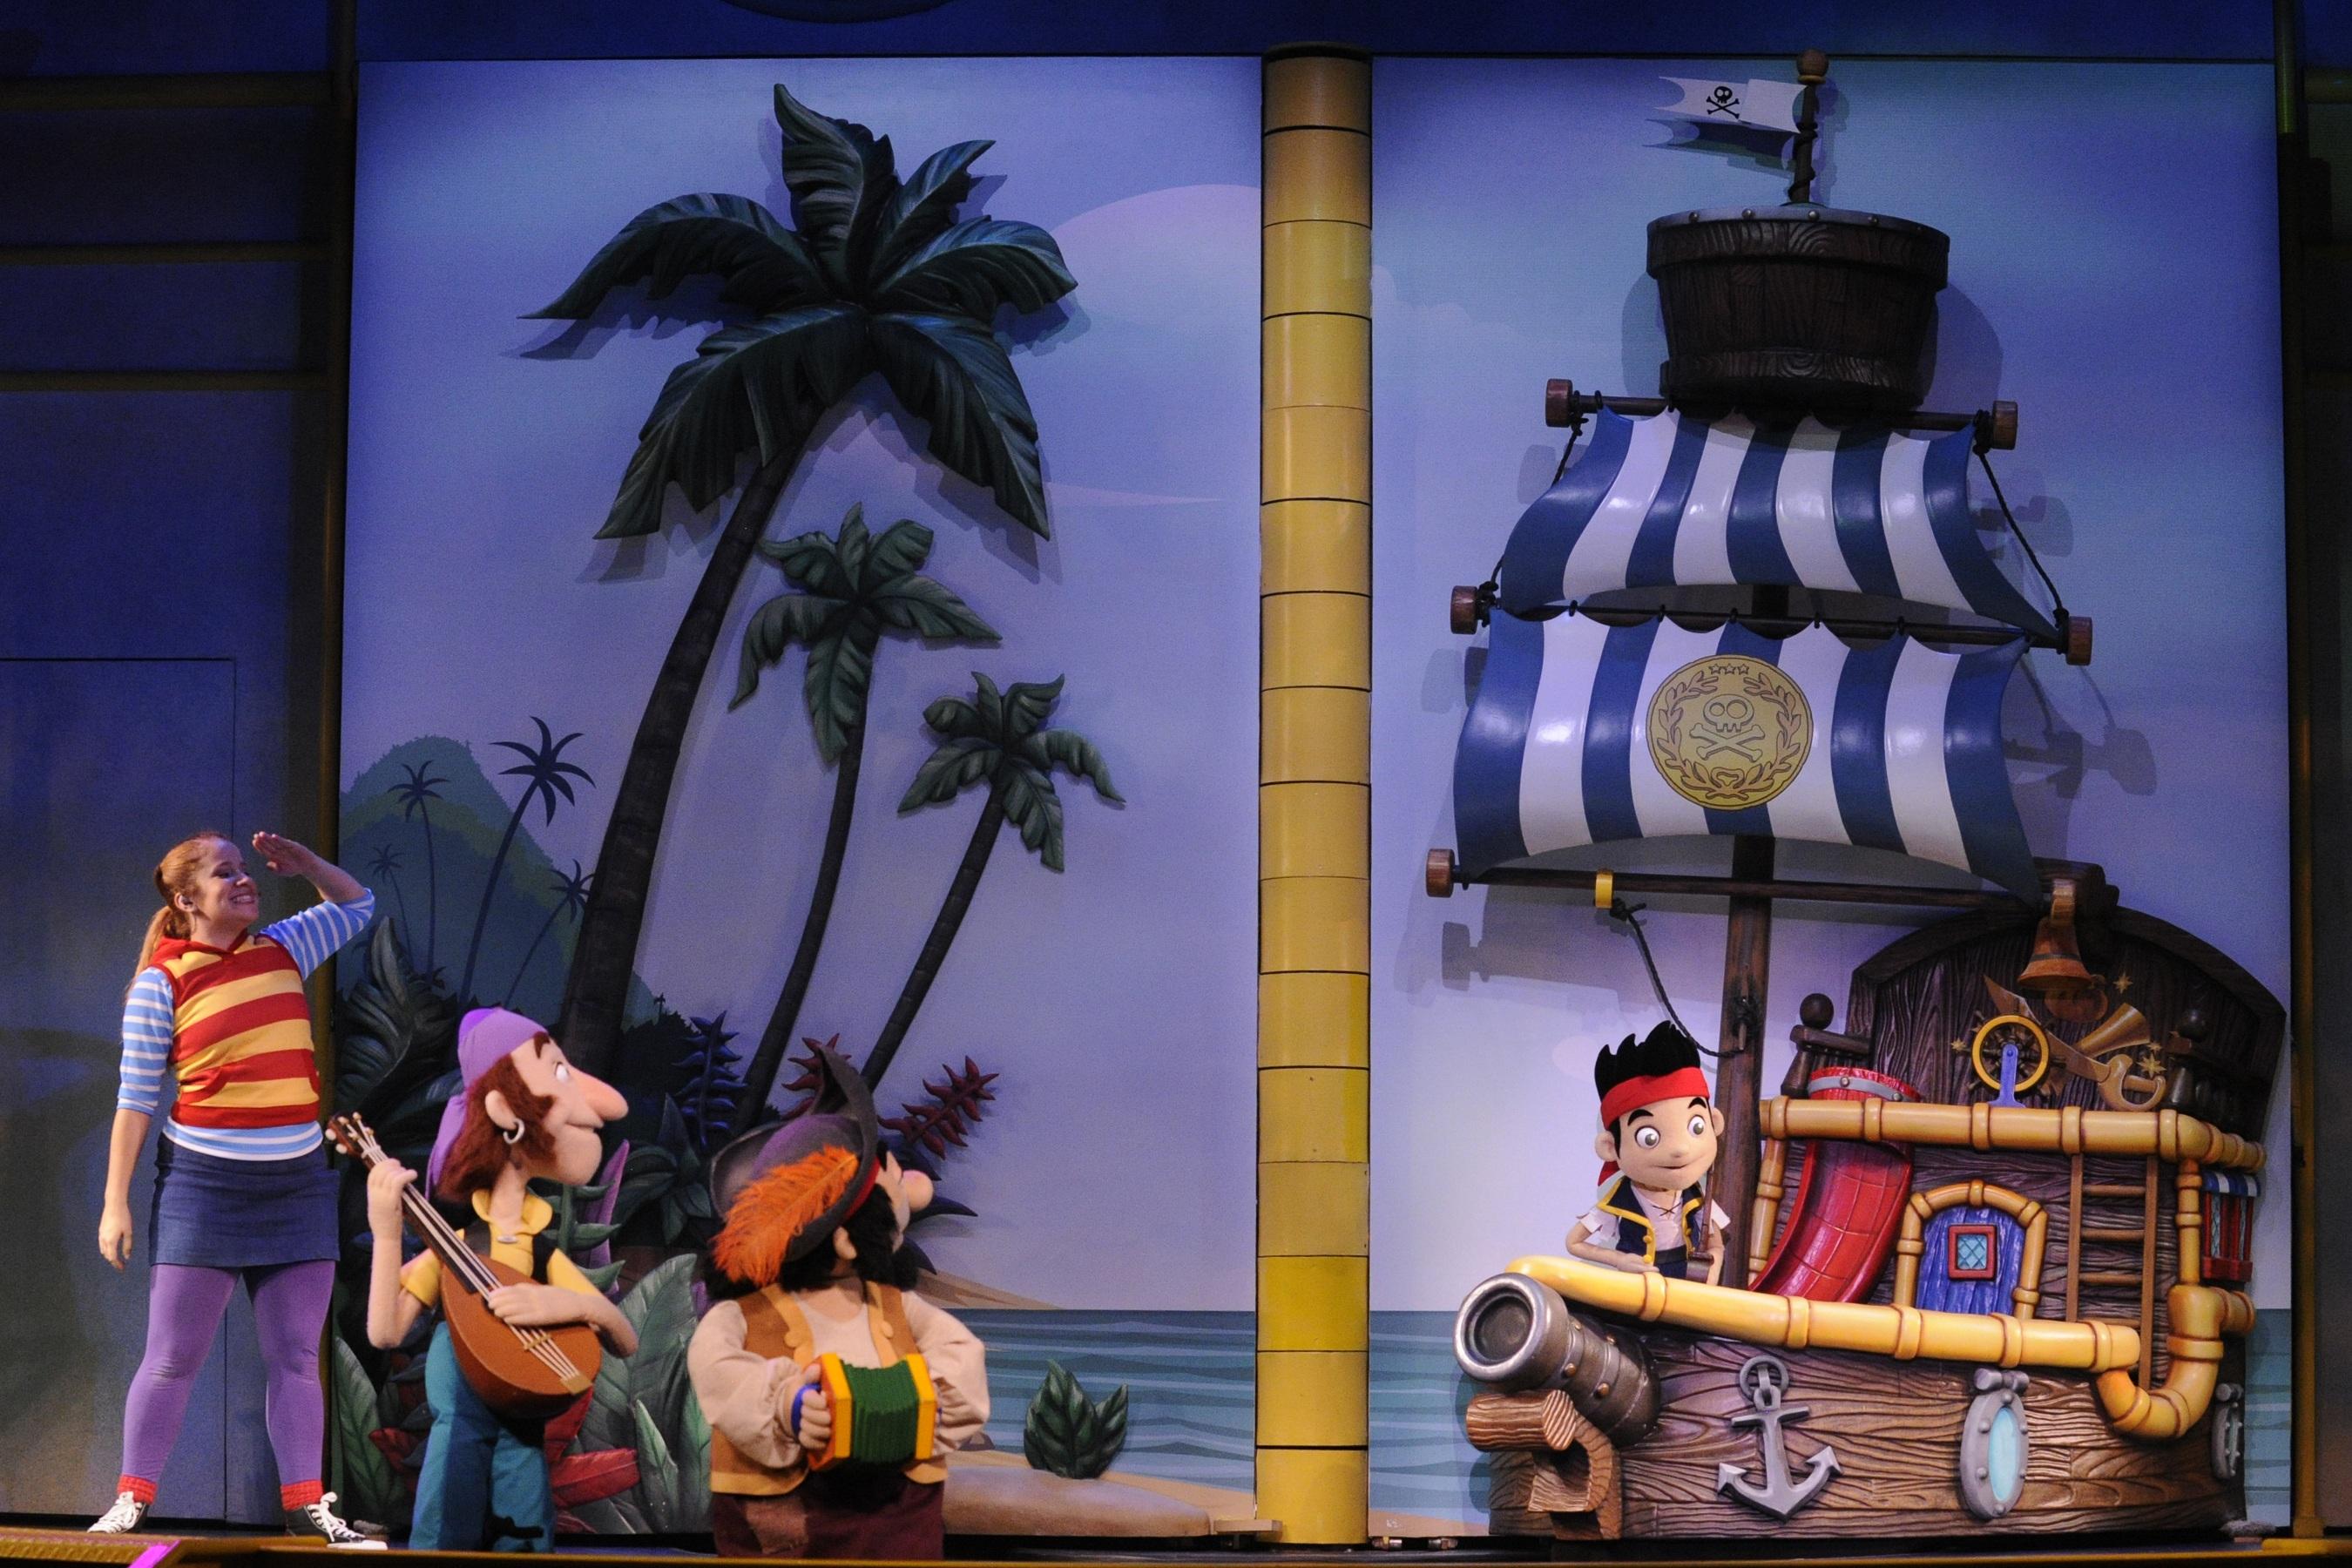 Disney Junior Live on Stage at Disney California Adventure